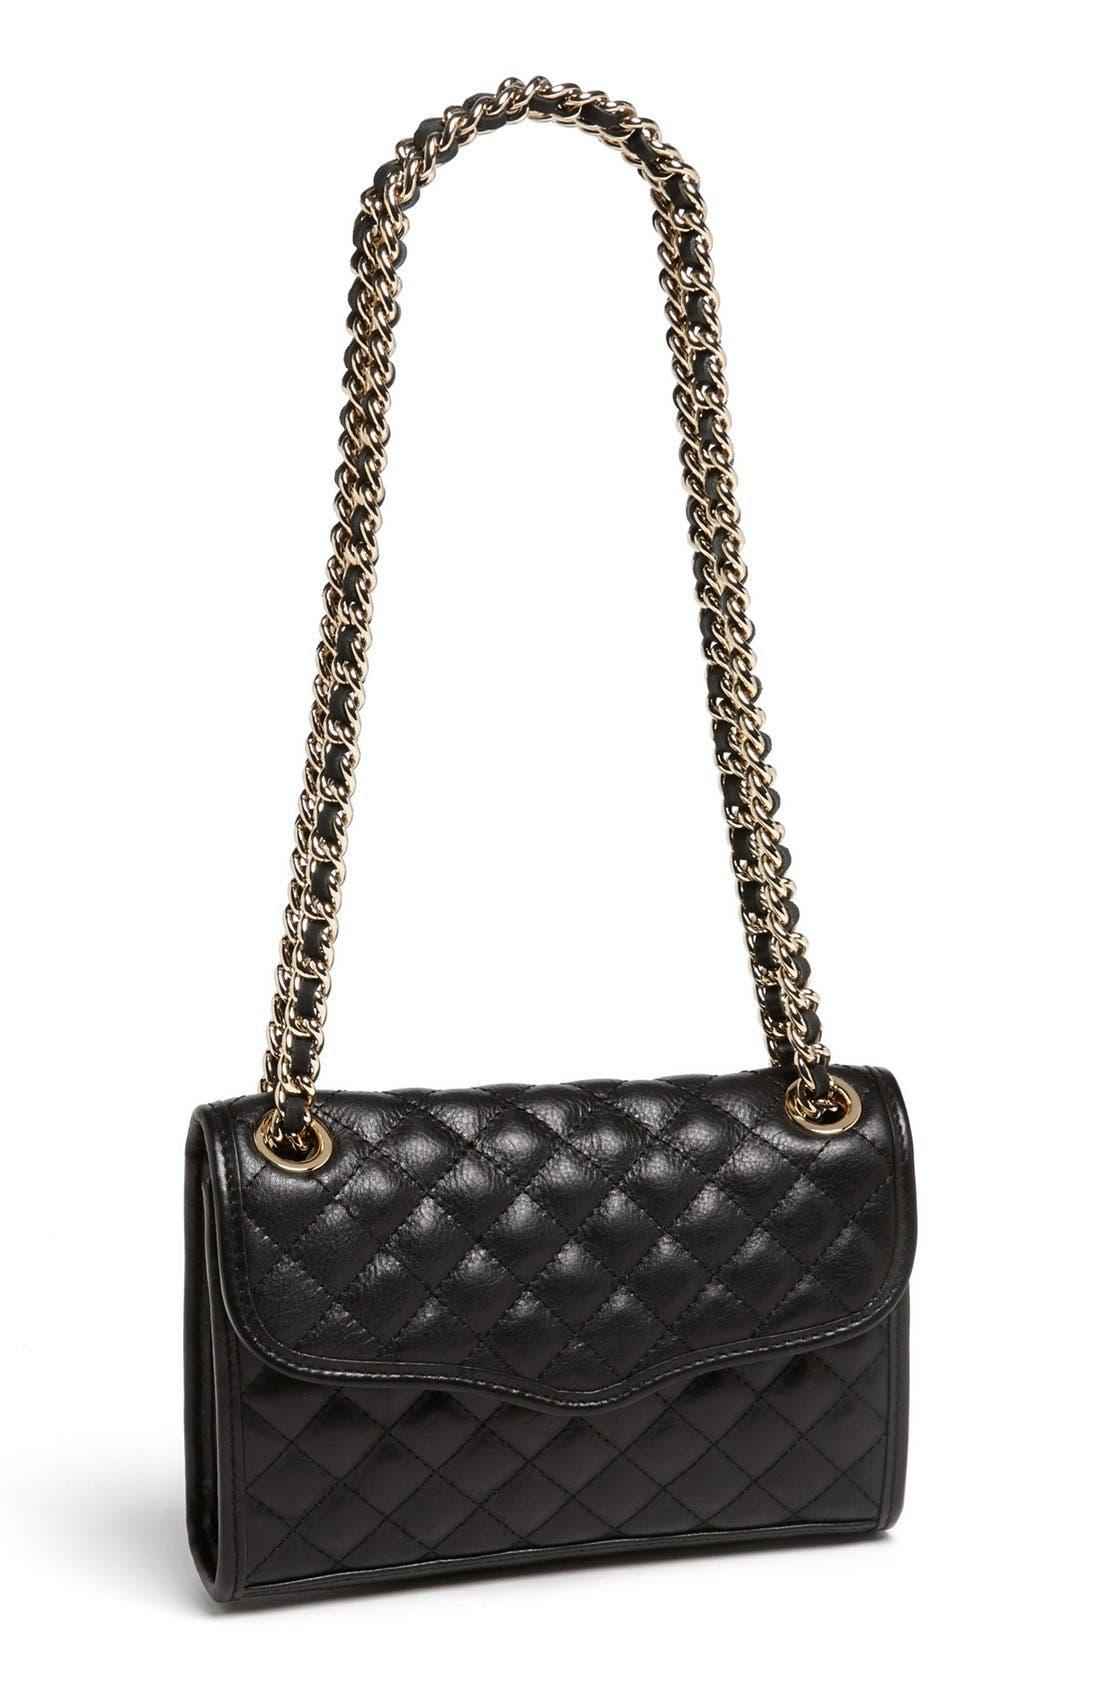 'Quilted Mini Affair' Convertible Crossbody Bag,                             Main thumbnail 1, color,                             001